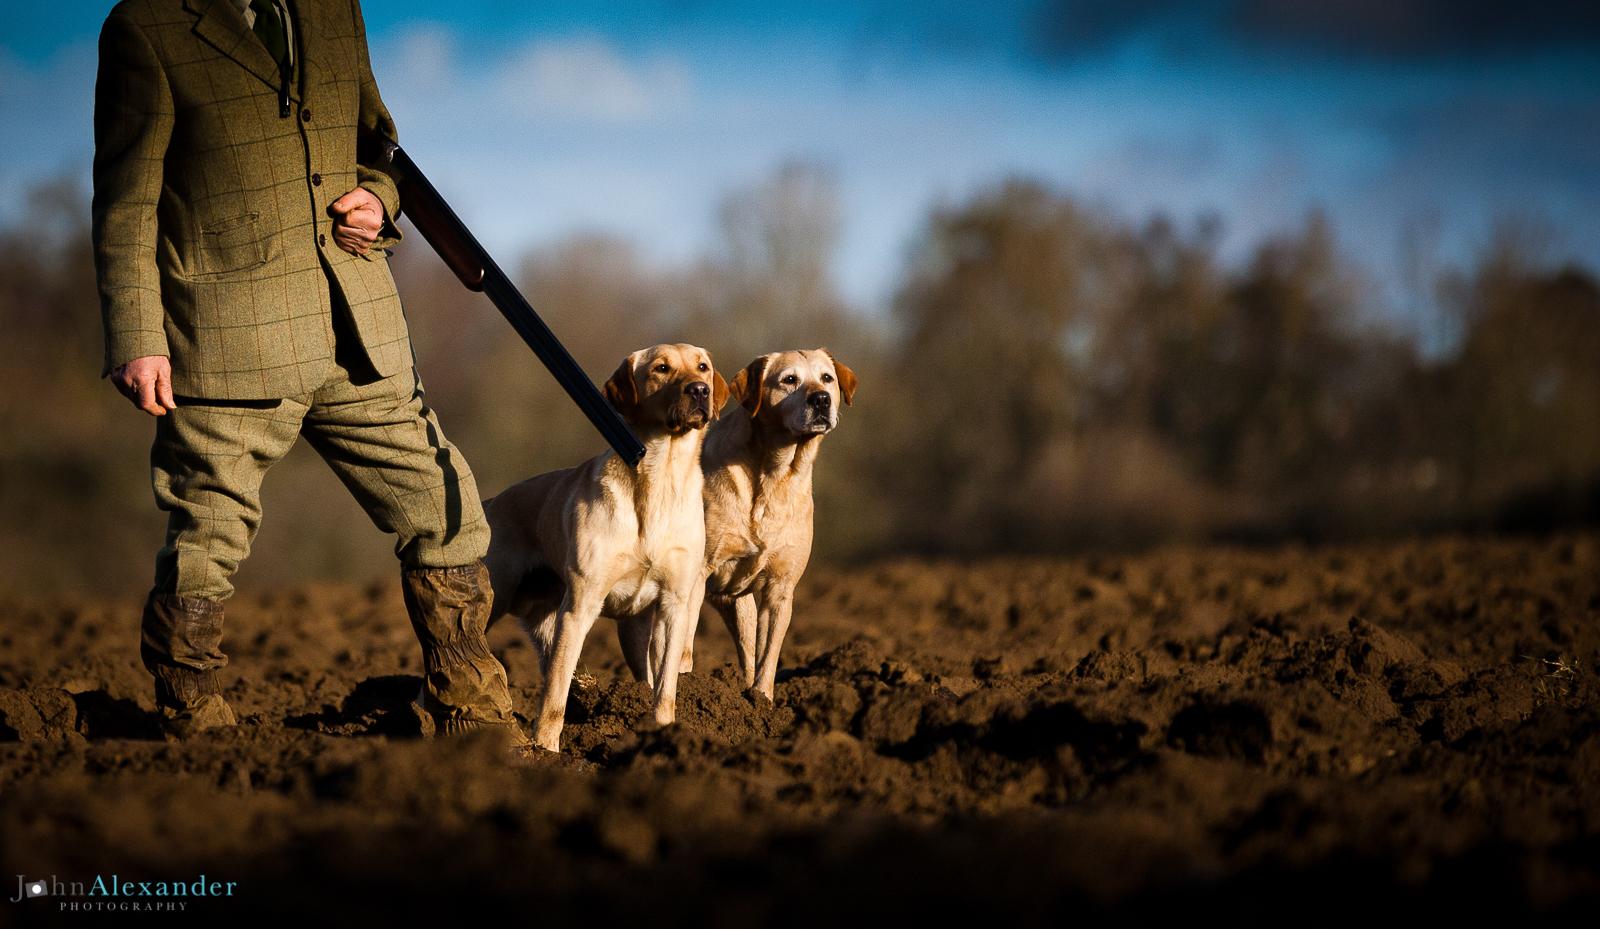 Two labrador gun dogs on peg with gun and shotgun